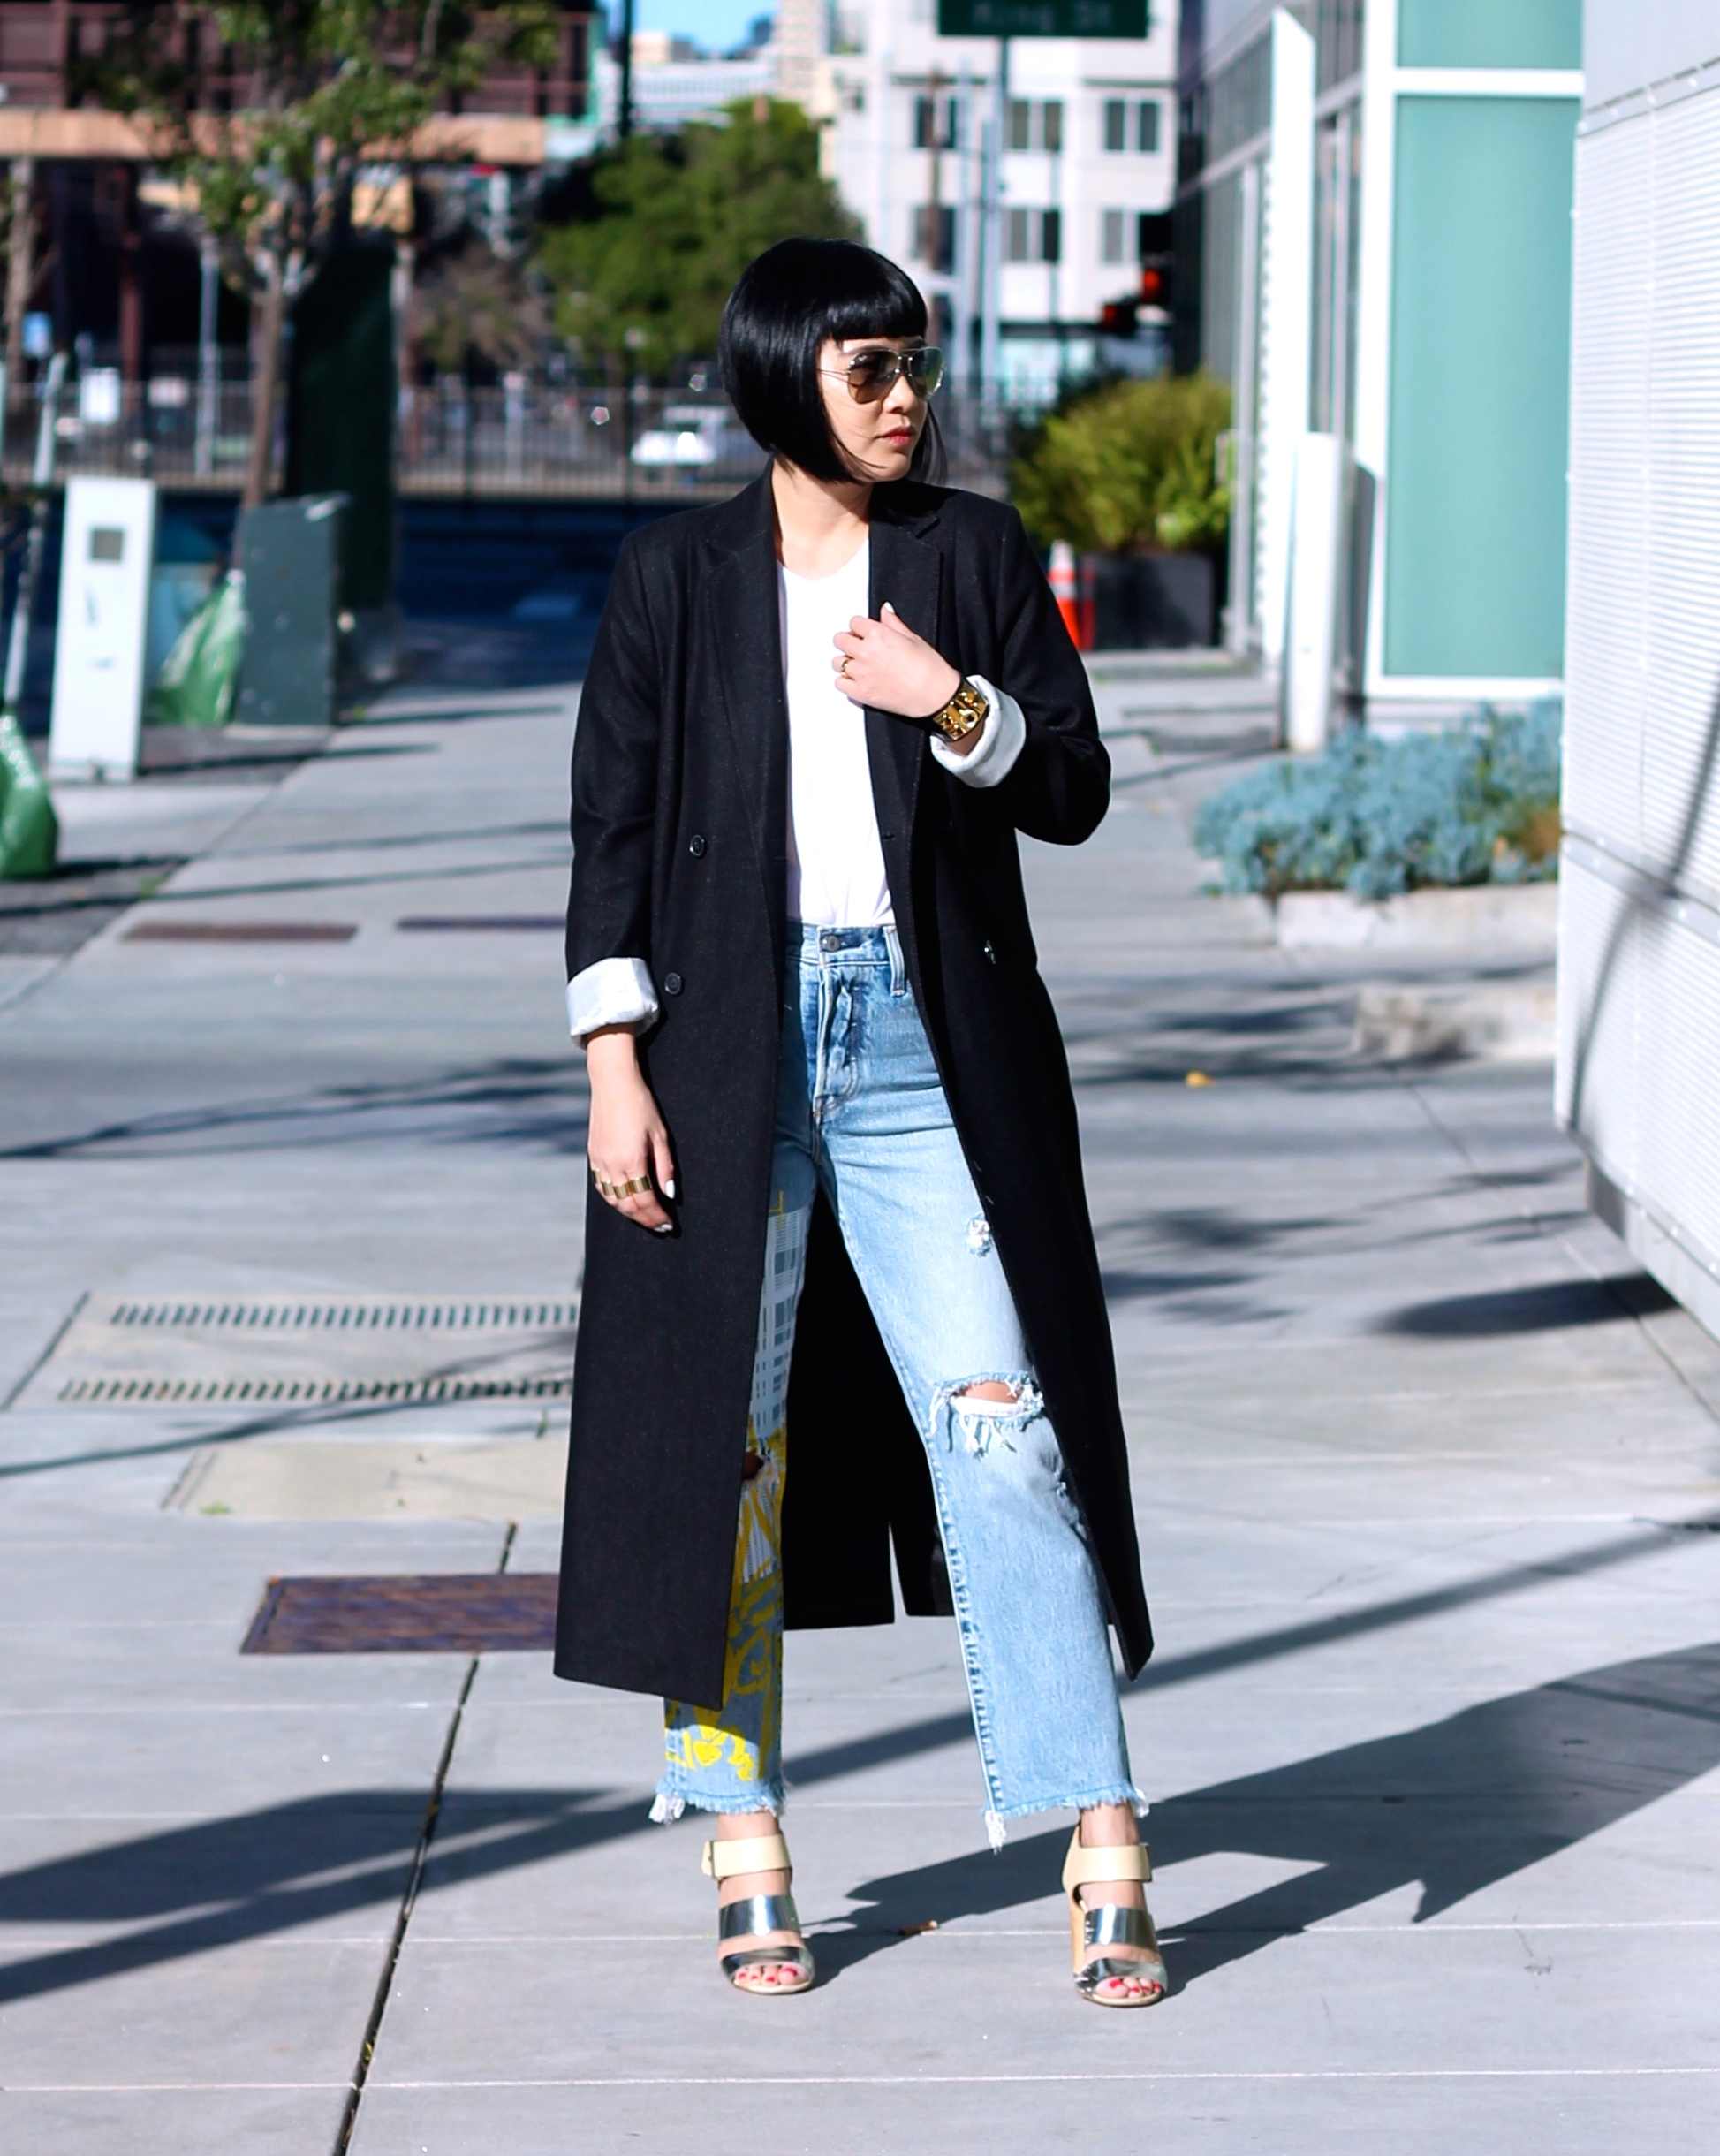 Hair c/o Sassoon Salon, Wilford Coat, tee c/o Cuyana, custom jeans c/o Levi's custom jeans, print by DVF, Sam Edelman shoes, Ray-Ban sunglasses, Hermes bracelet, Margiela rings